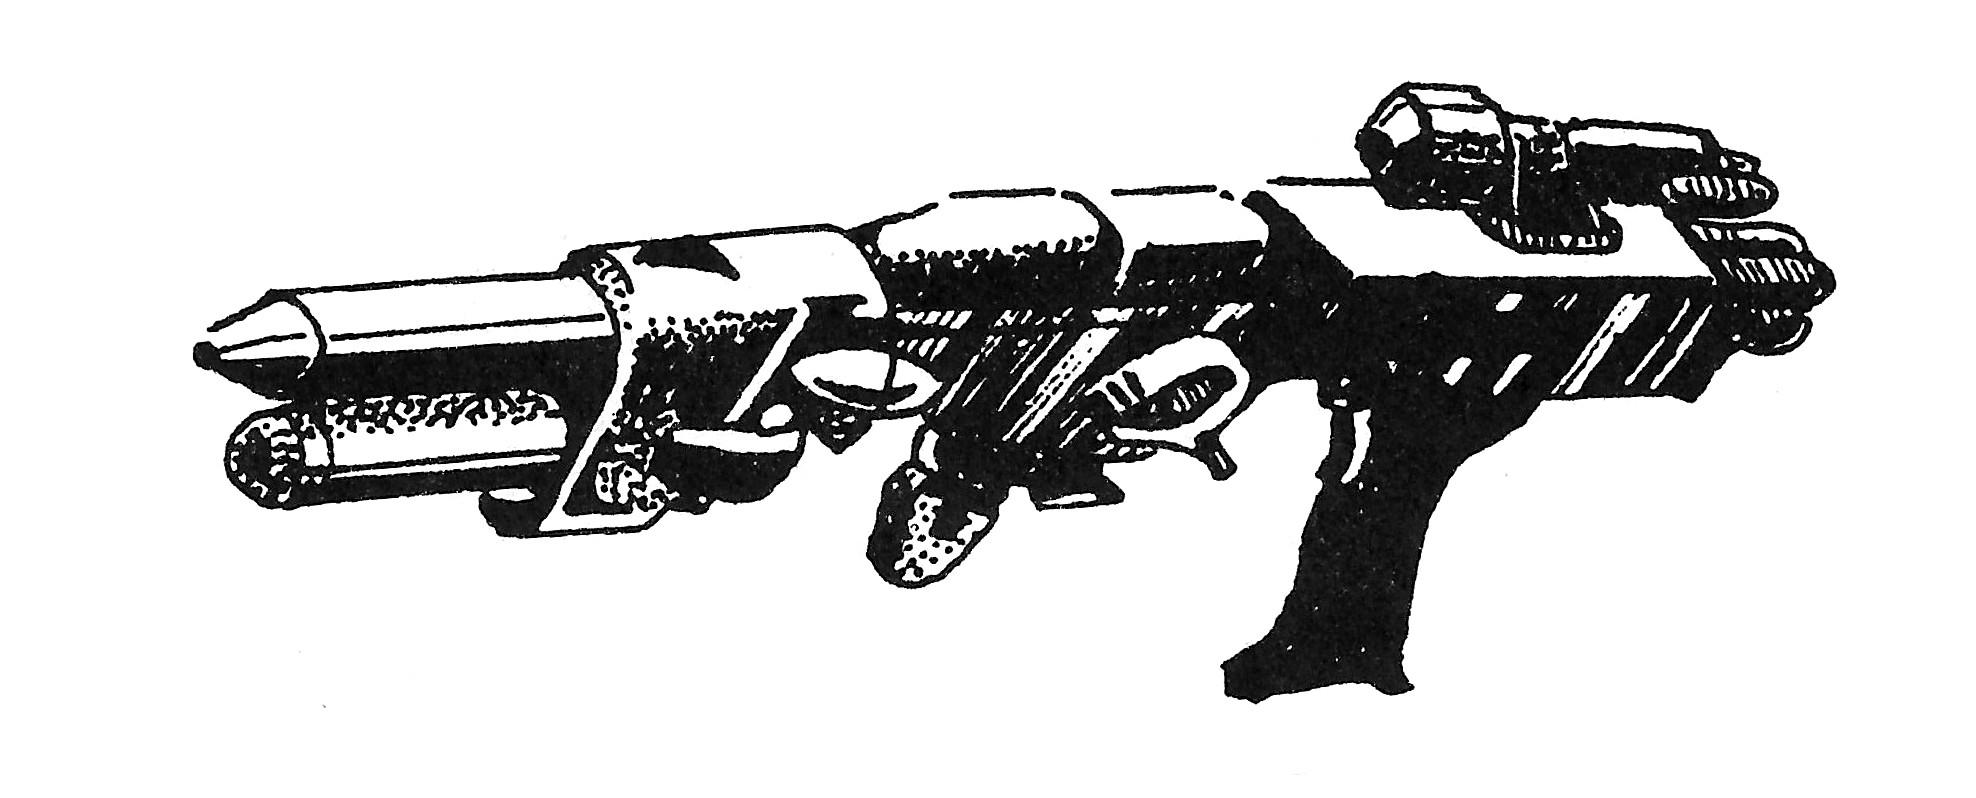 Monument City Rrg Lar 10 Laser Assault Rifle Gallery